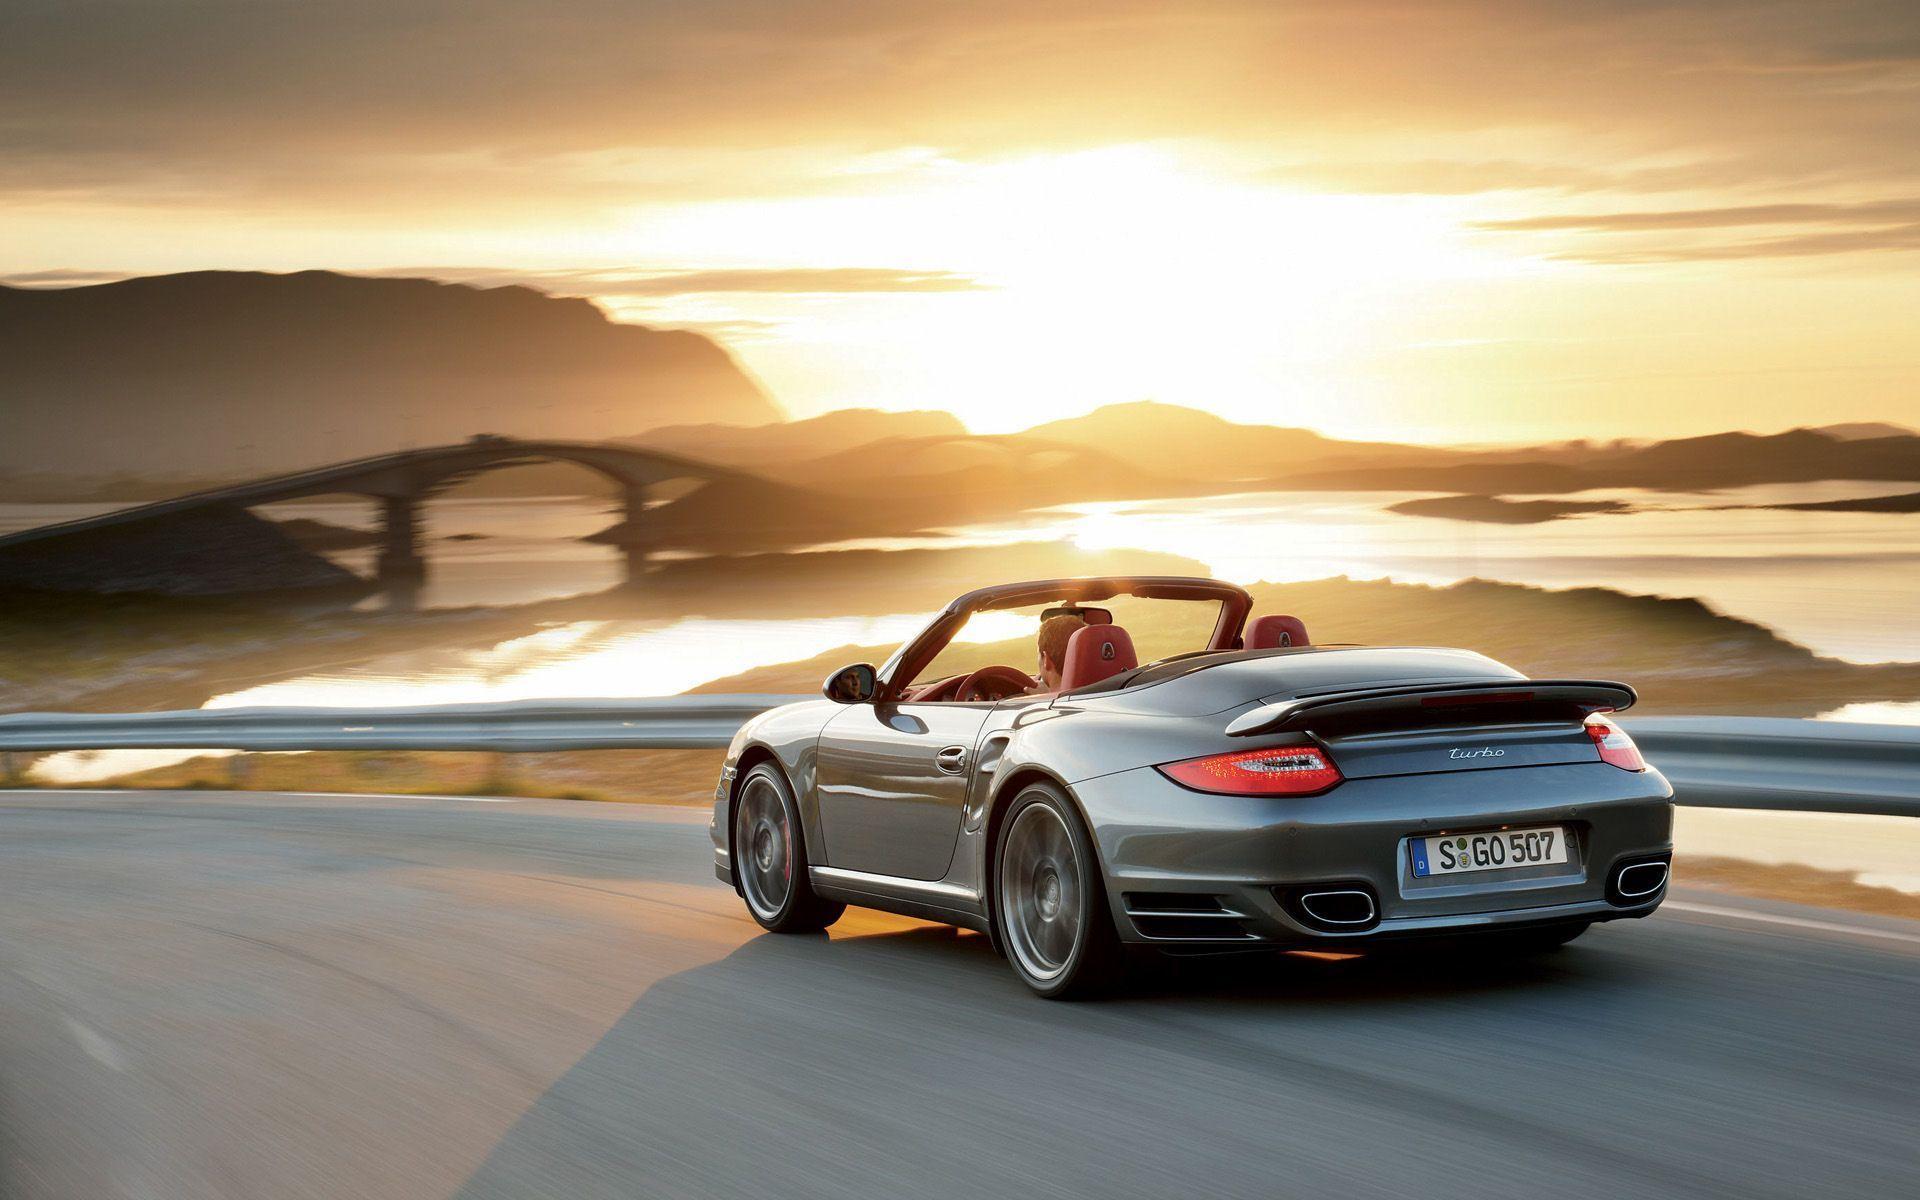 Porsche 911 Turbo Cabriolet wallpaper - 394945